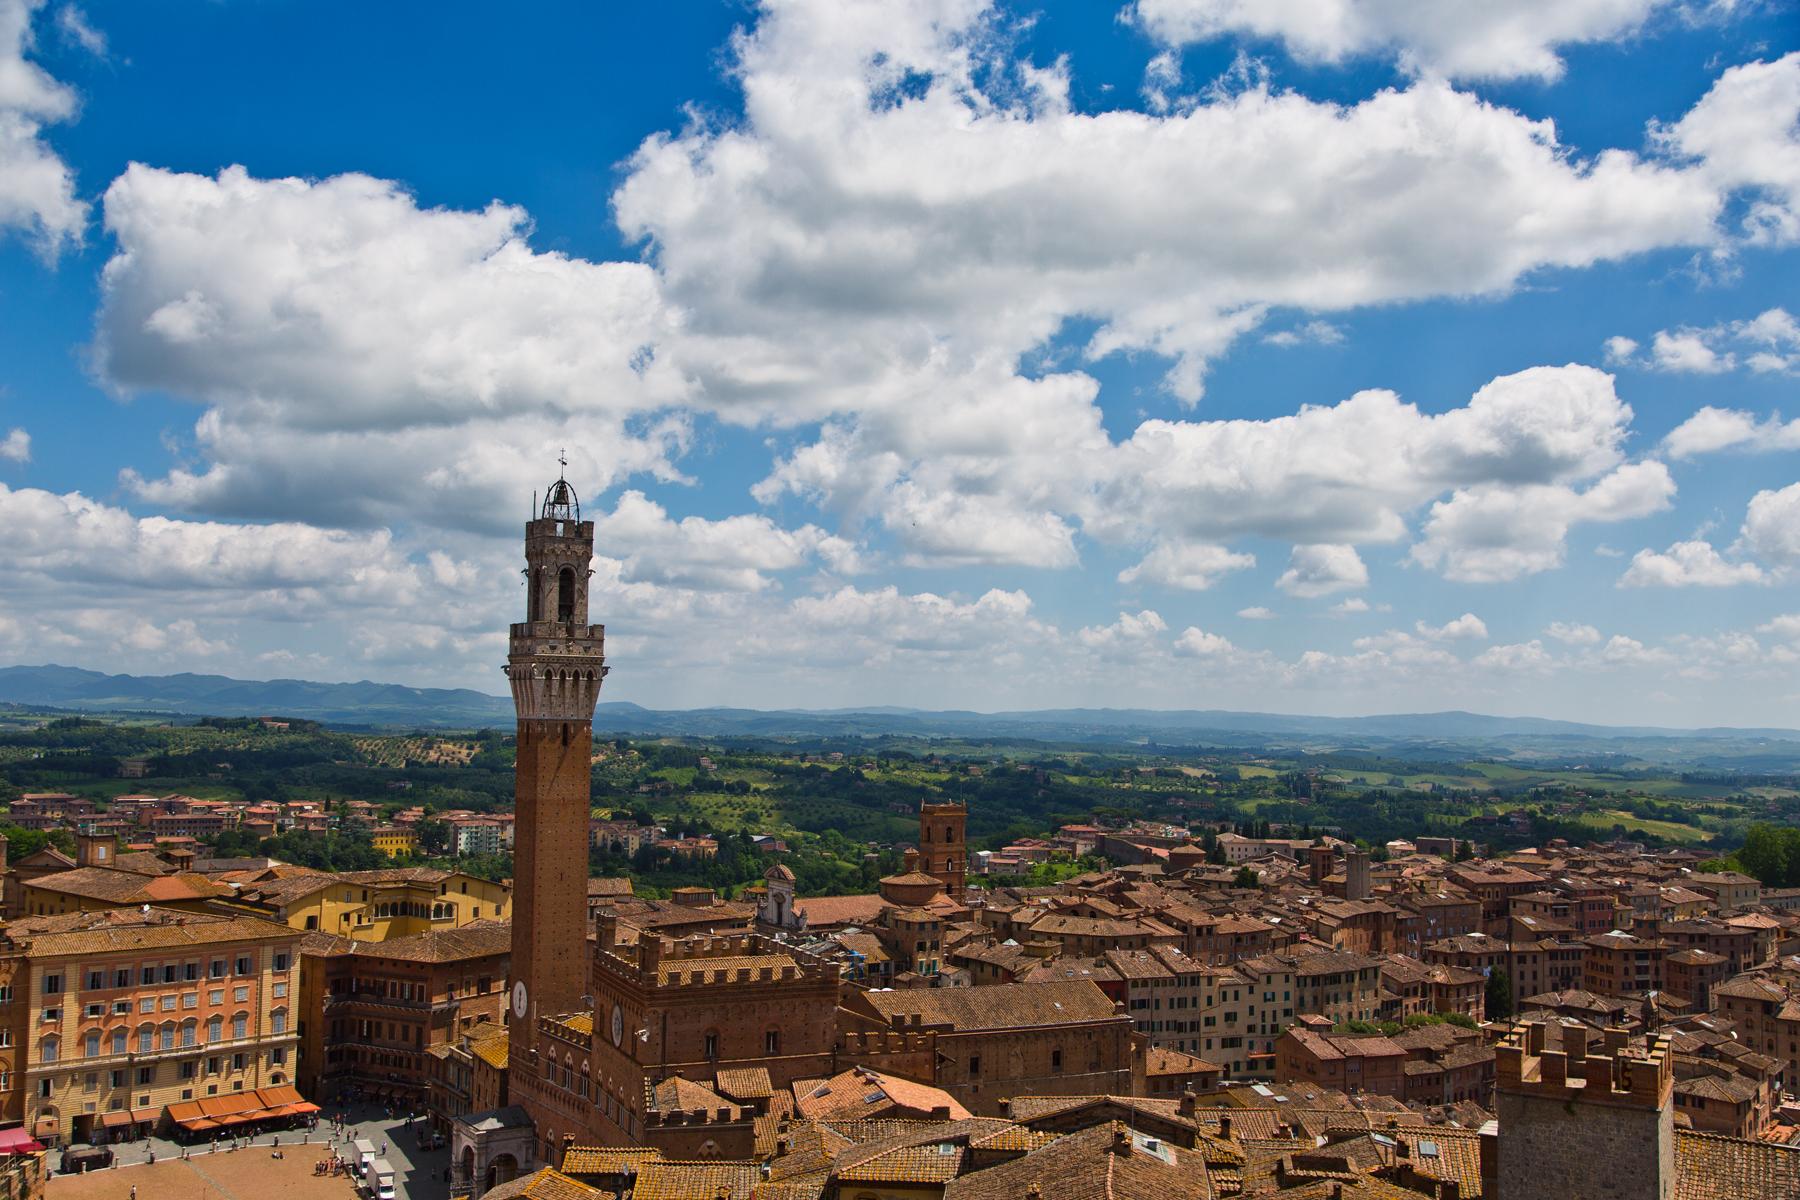 Blick auf Siena vom Duomo nuovo